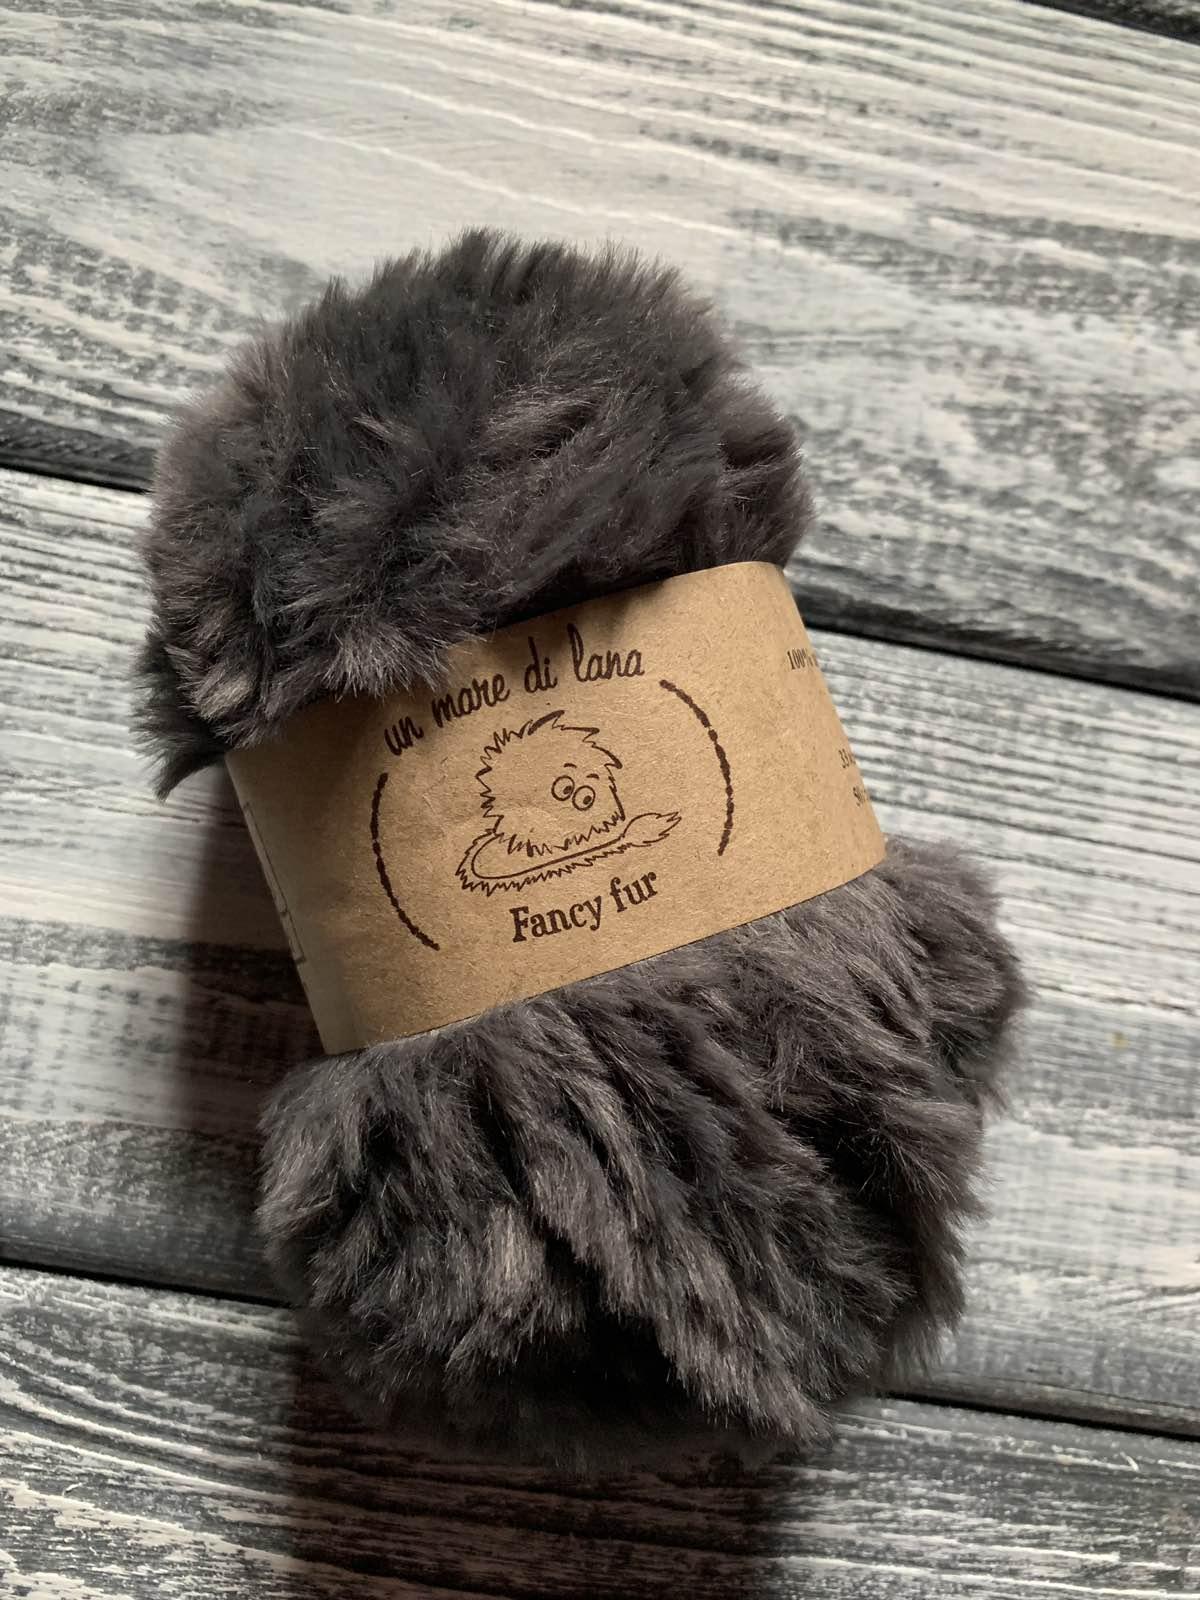 Wool Sea Fancy fur (Море шерсти Фанси фе ) 35 маренго заказать со скидкой в Минске